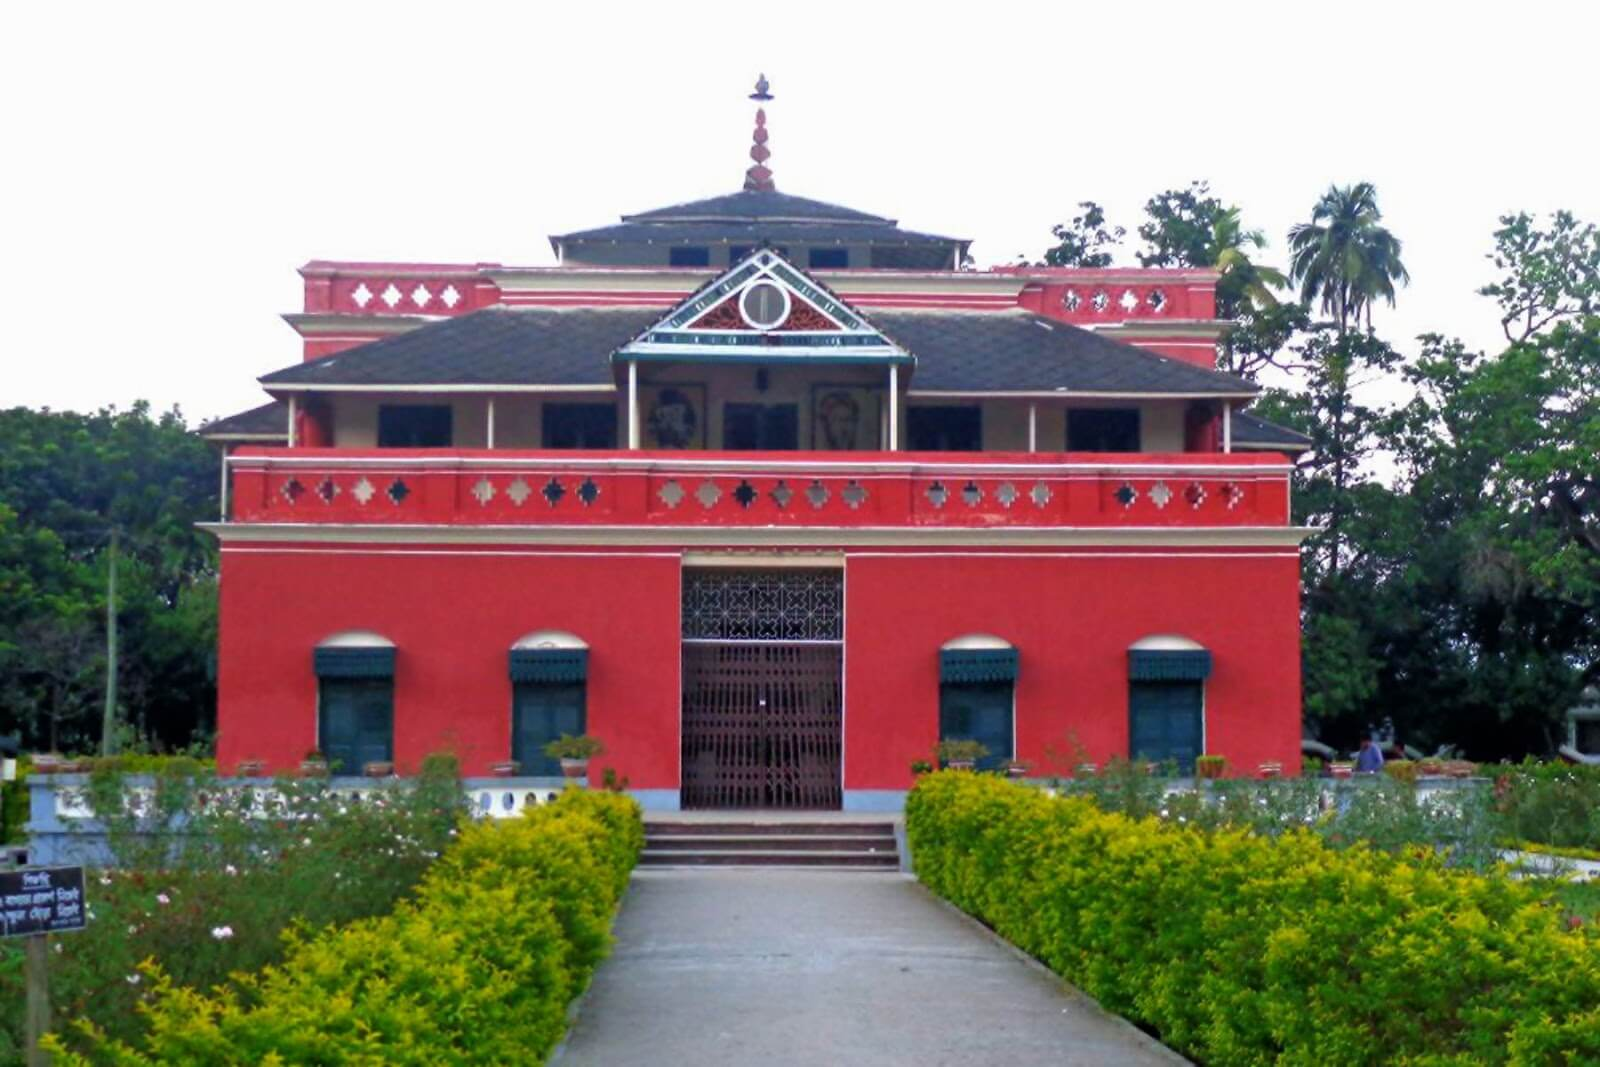 rabindranath tagore's shilaidaha kuthibari